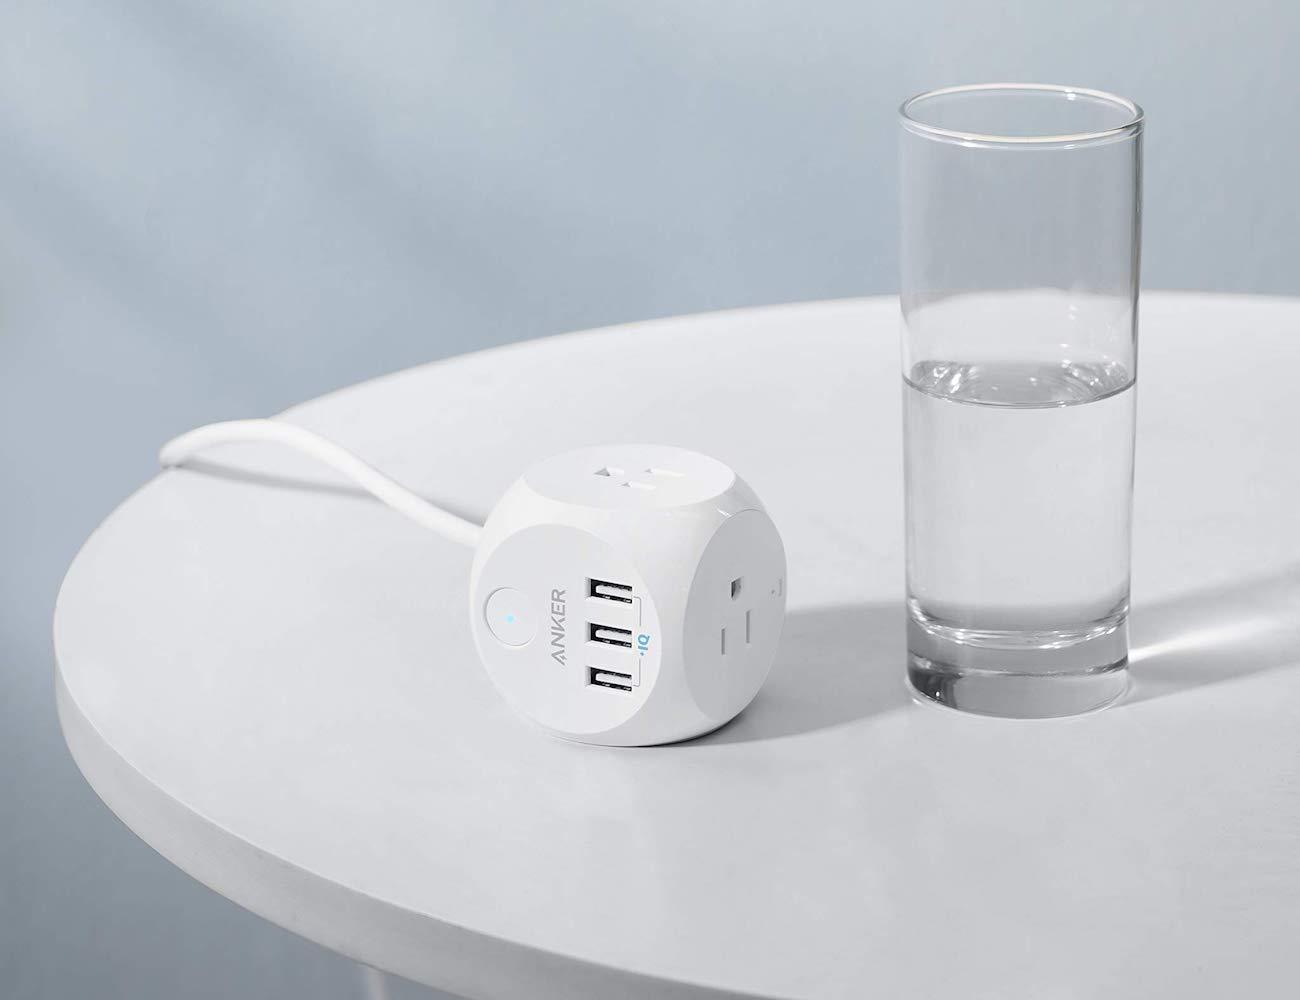 Anker PowerPort Cube Power Strip